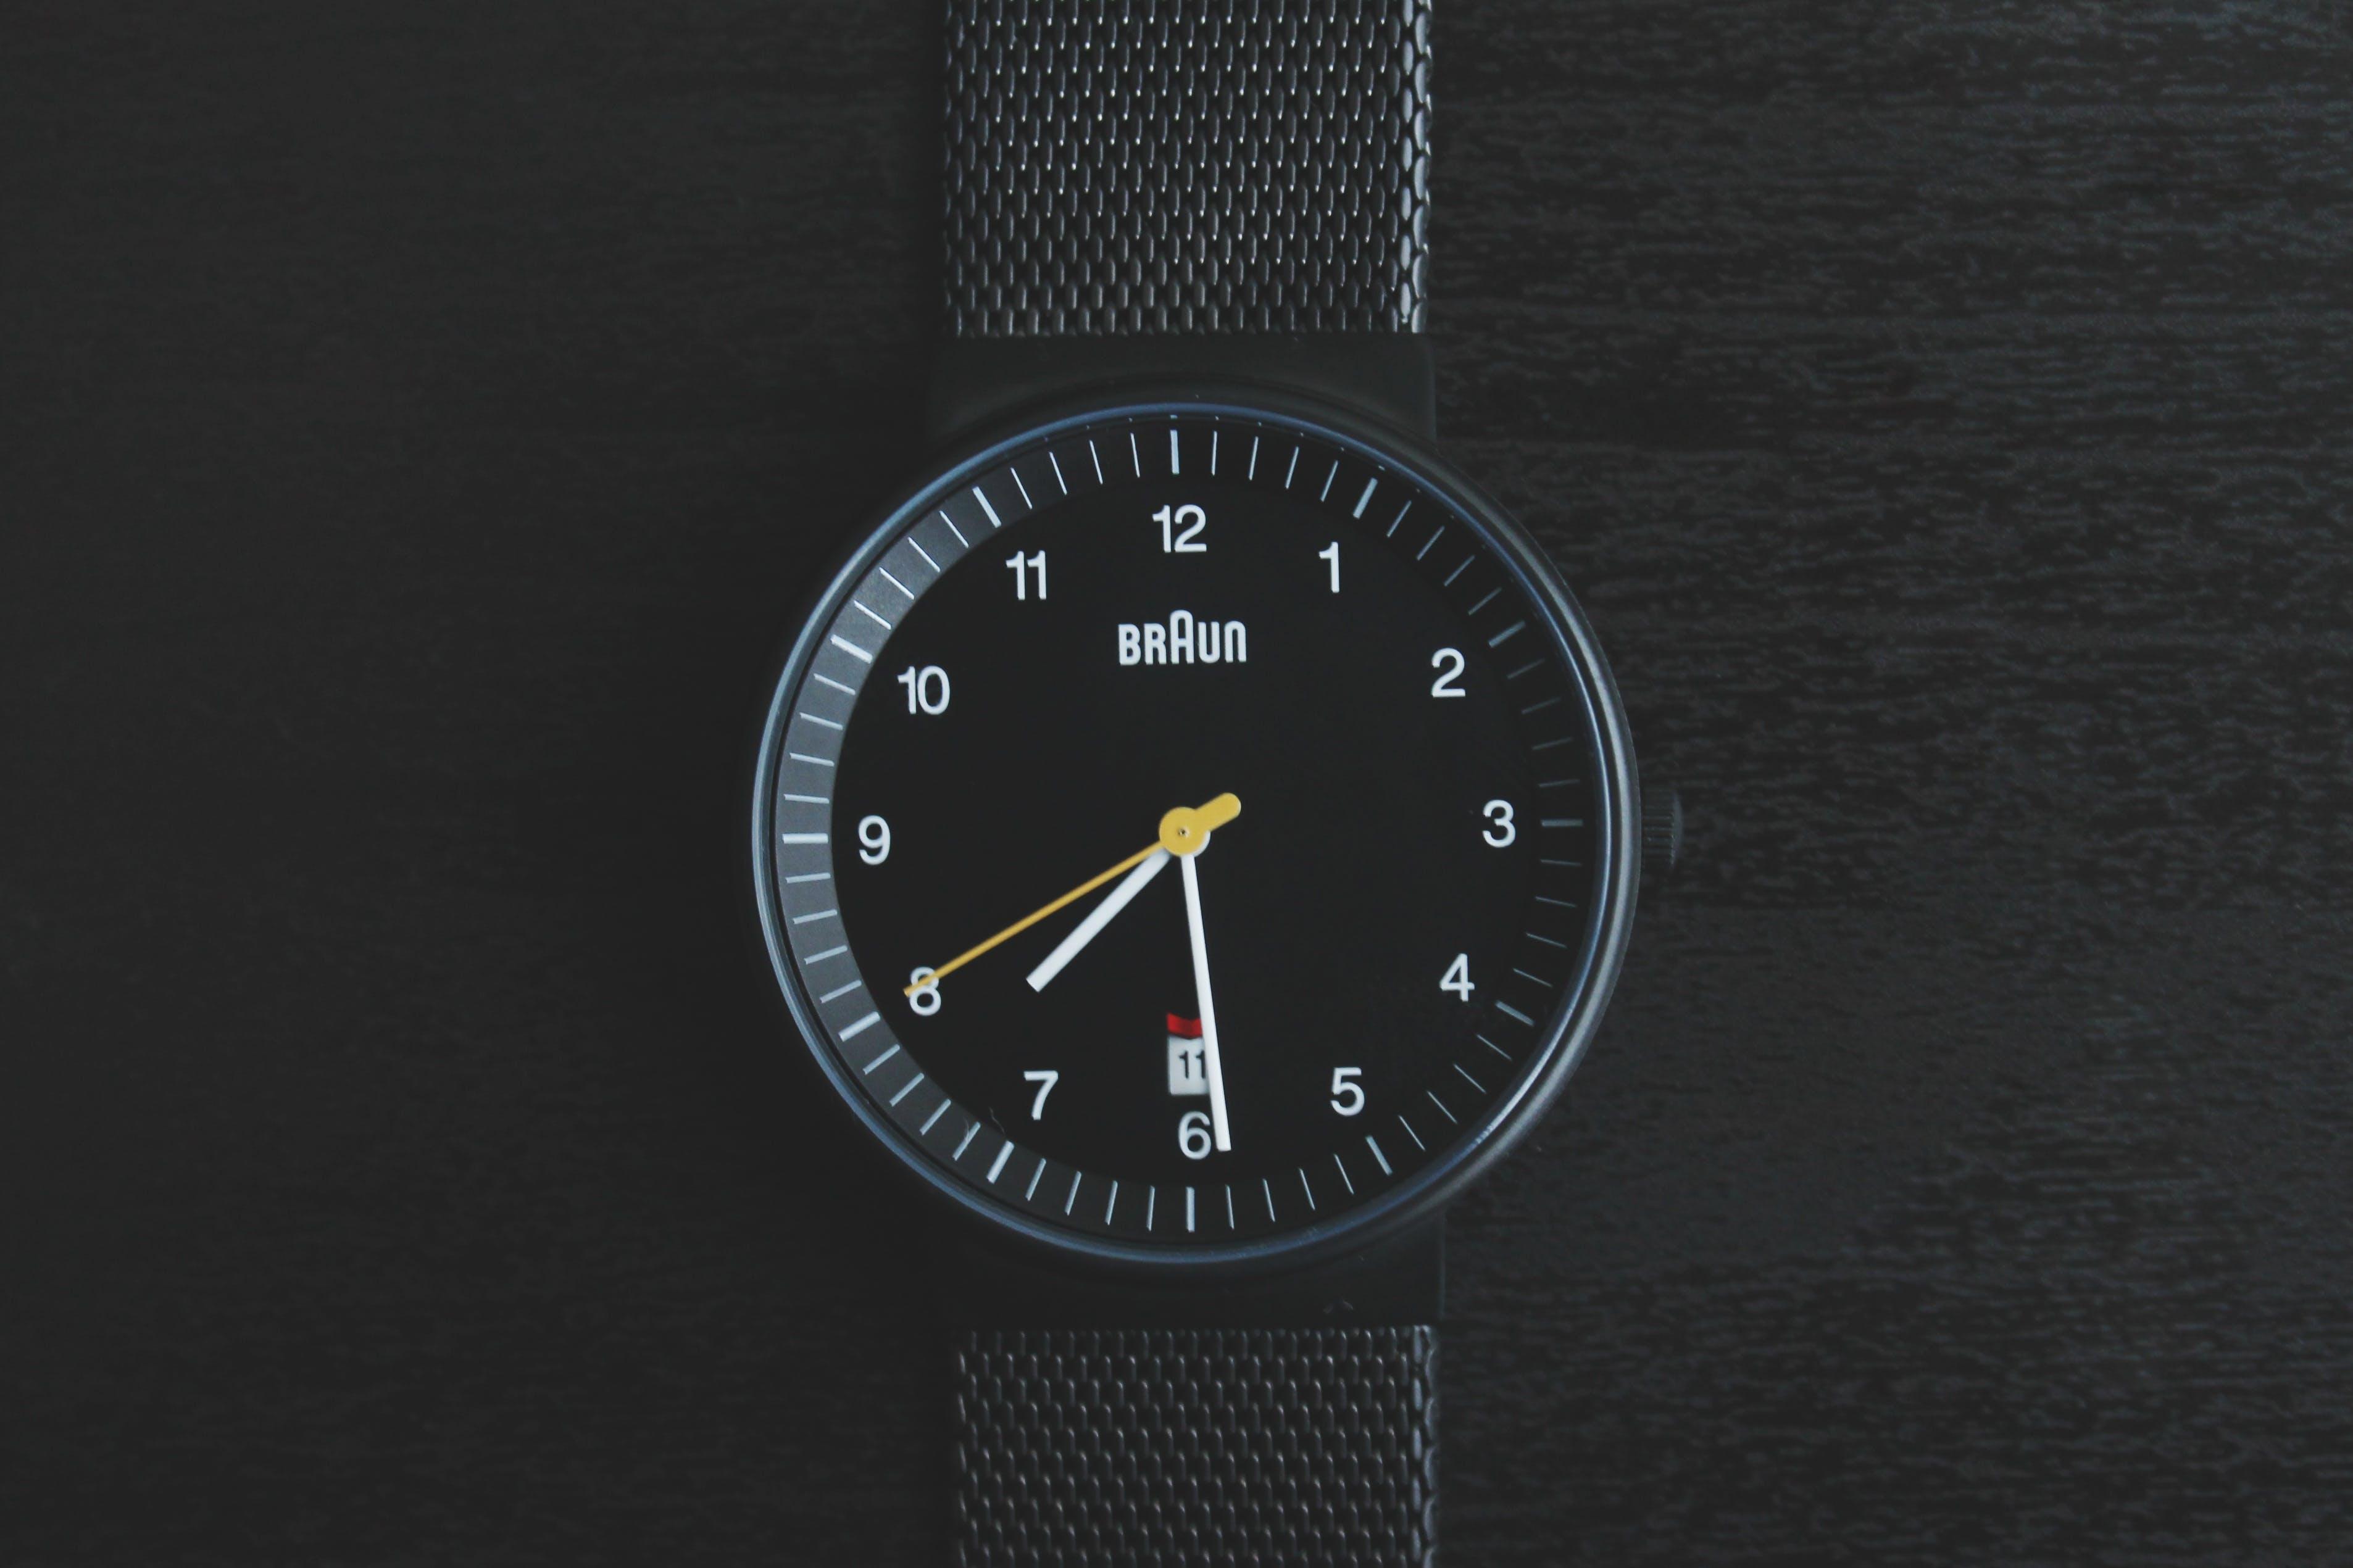 alarm, Analogue, black